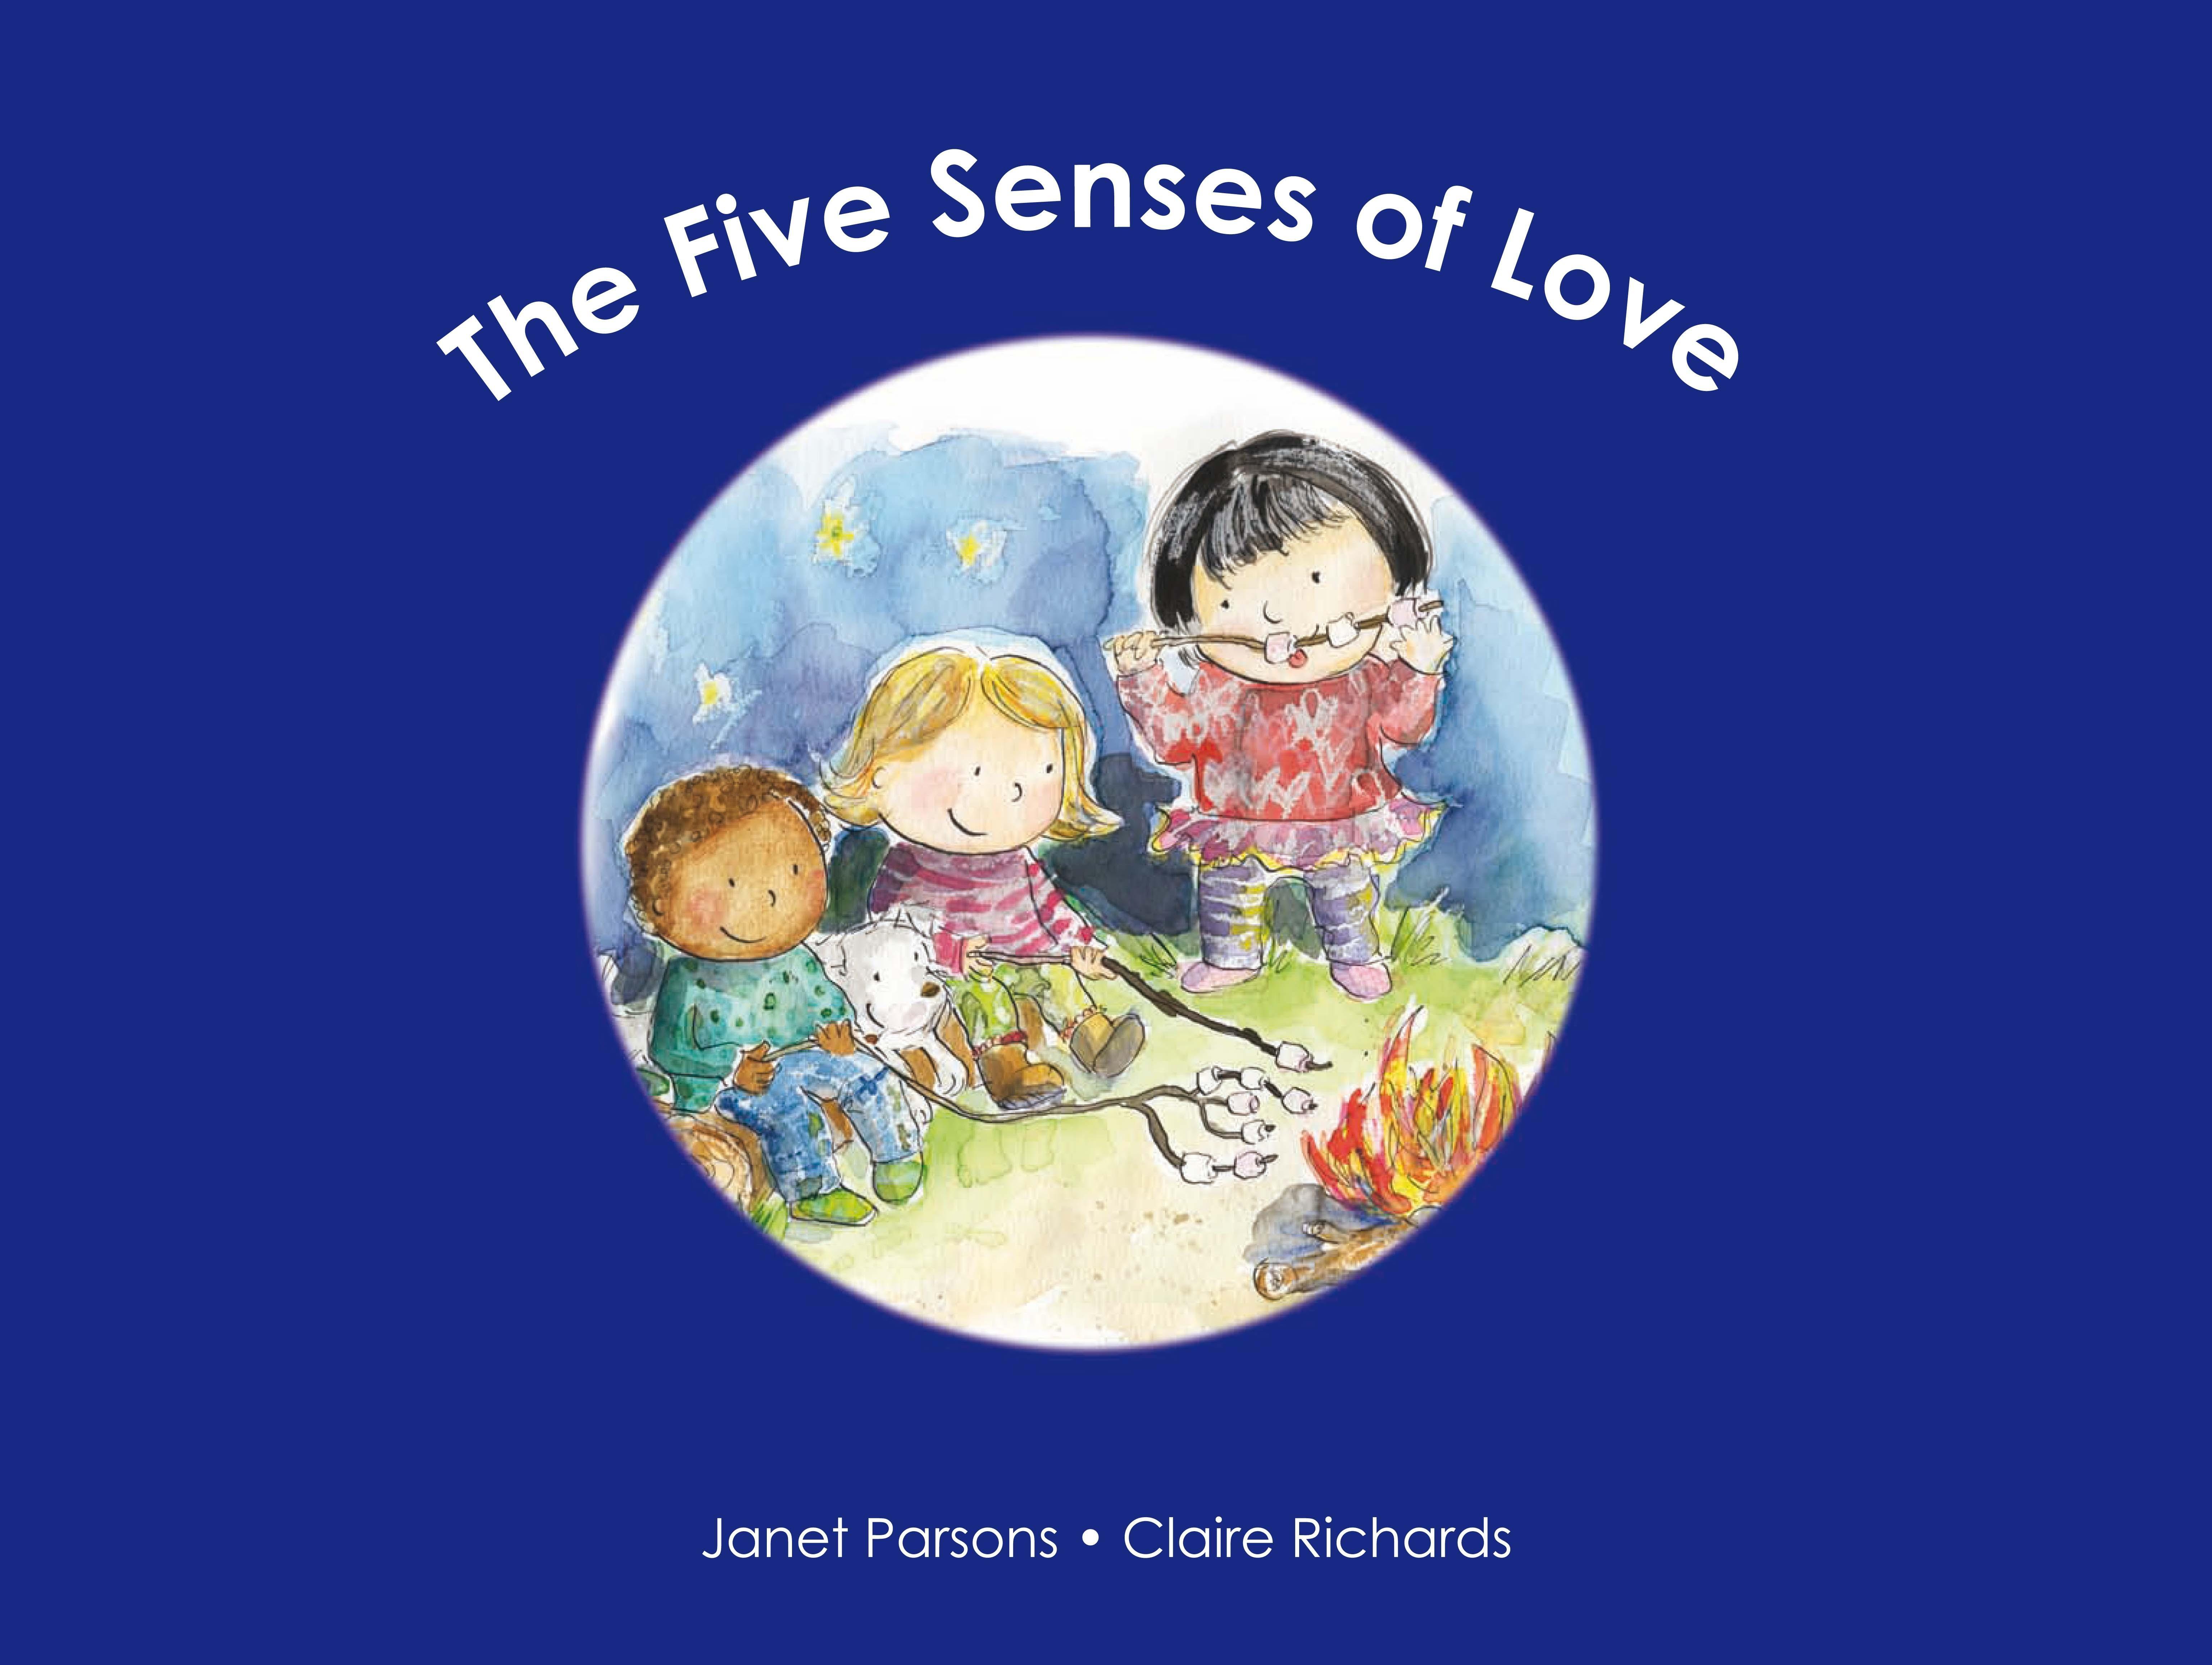 The Five Senses ofLove